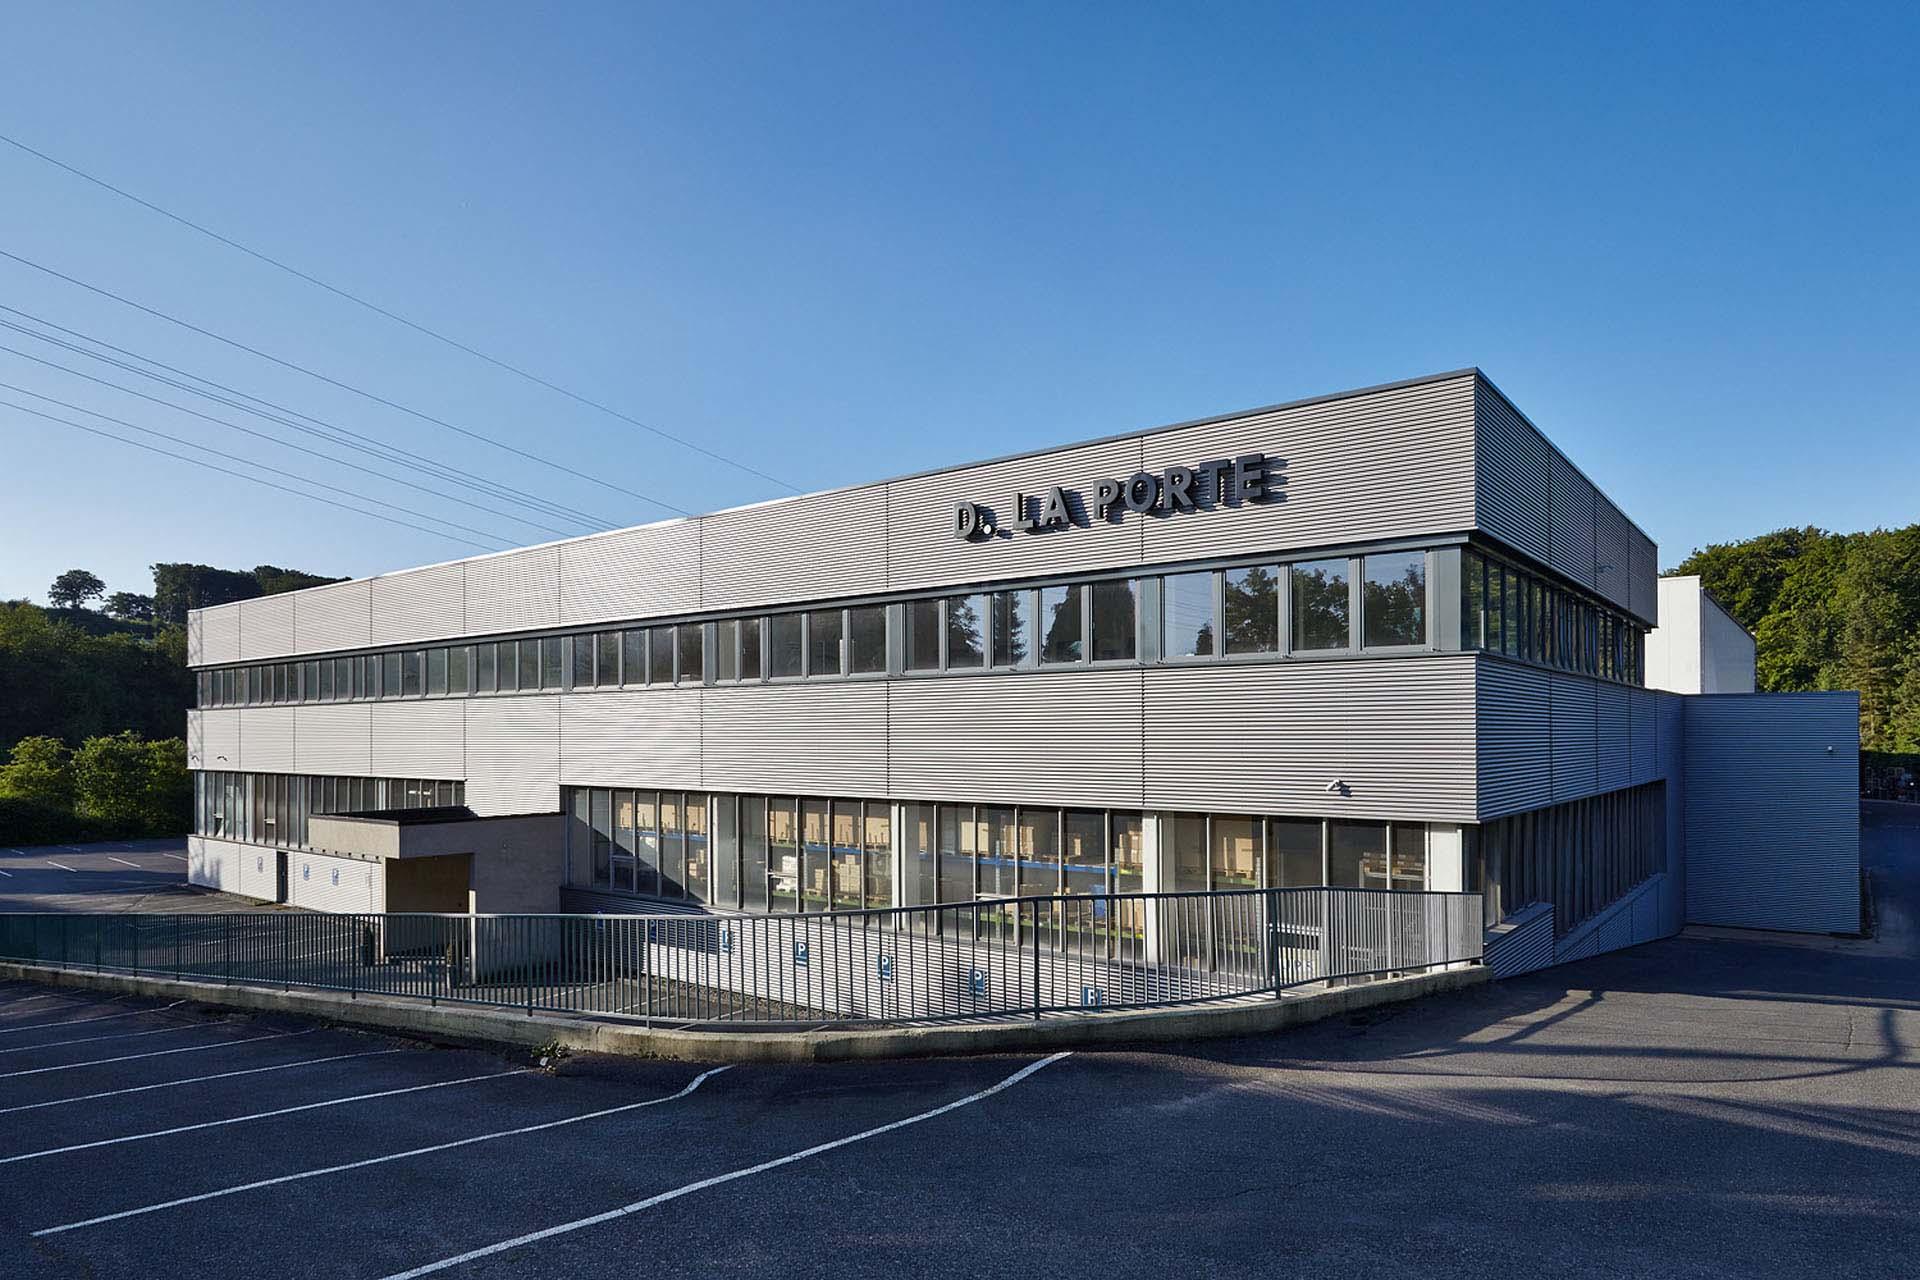 industrie-halle-fassade-02.jpg